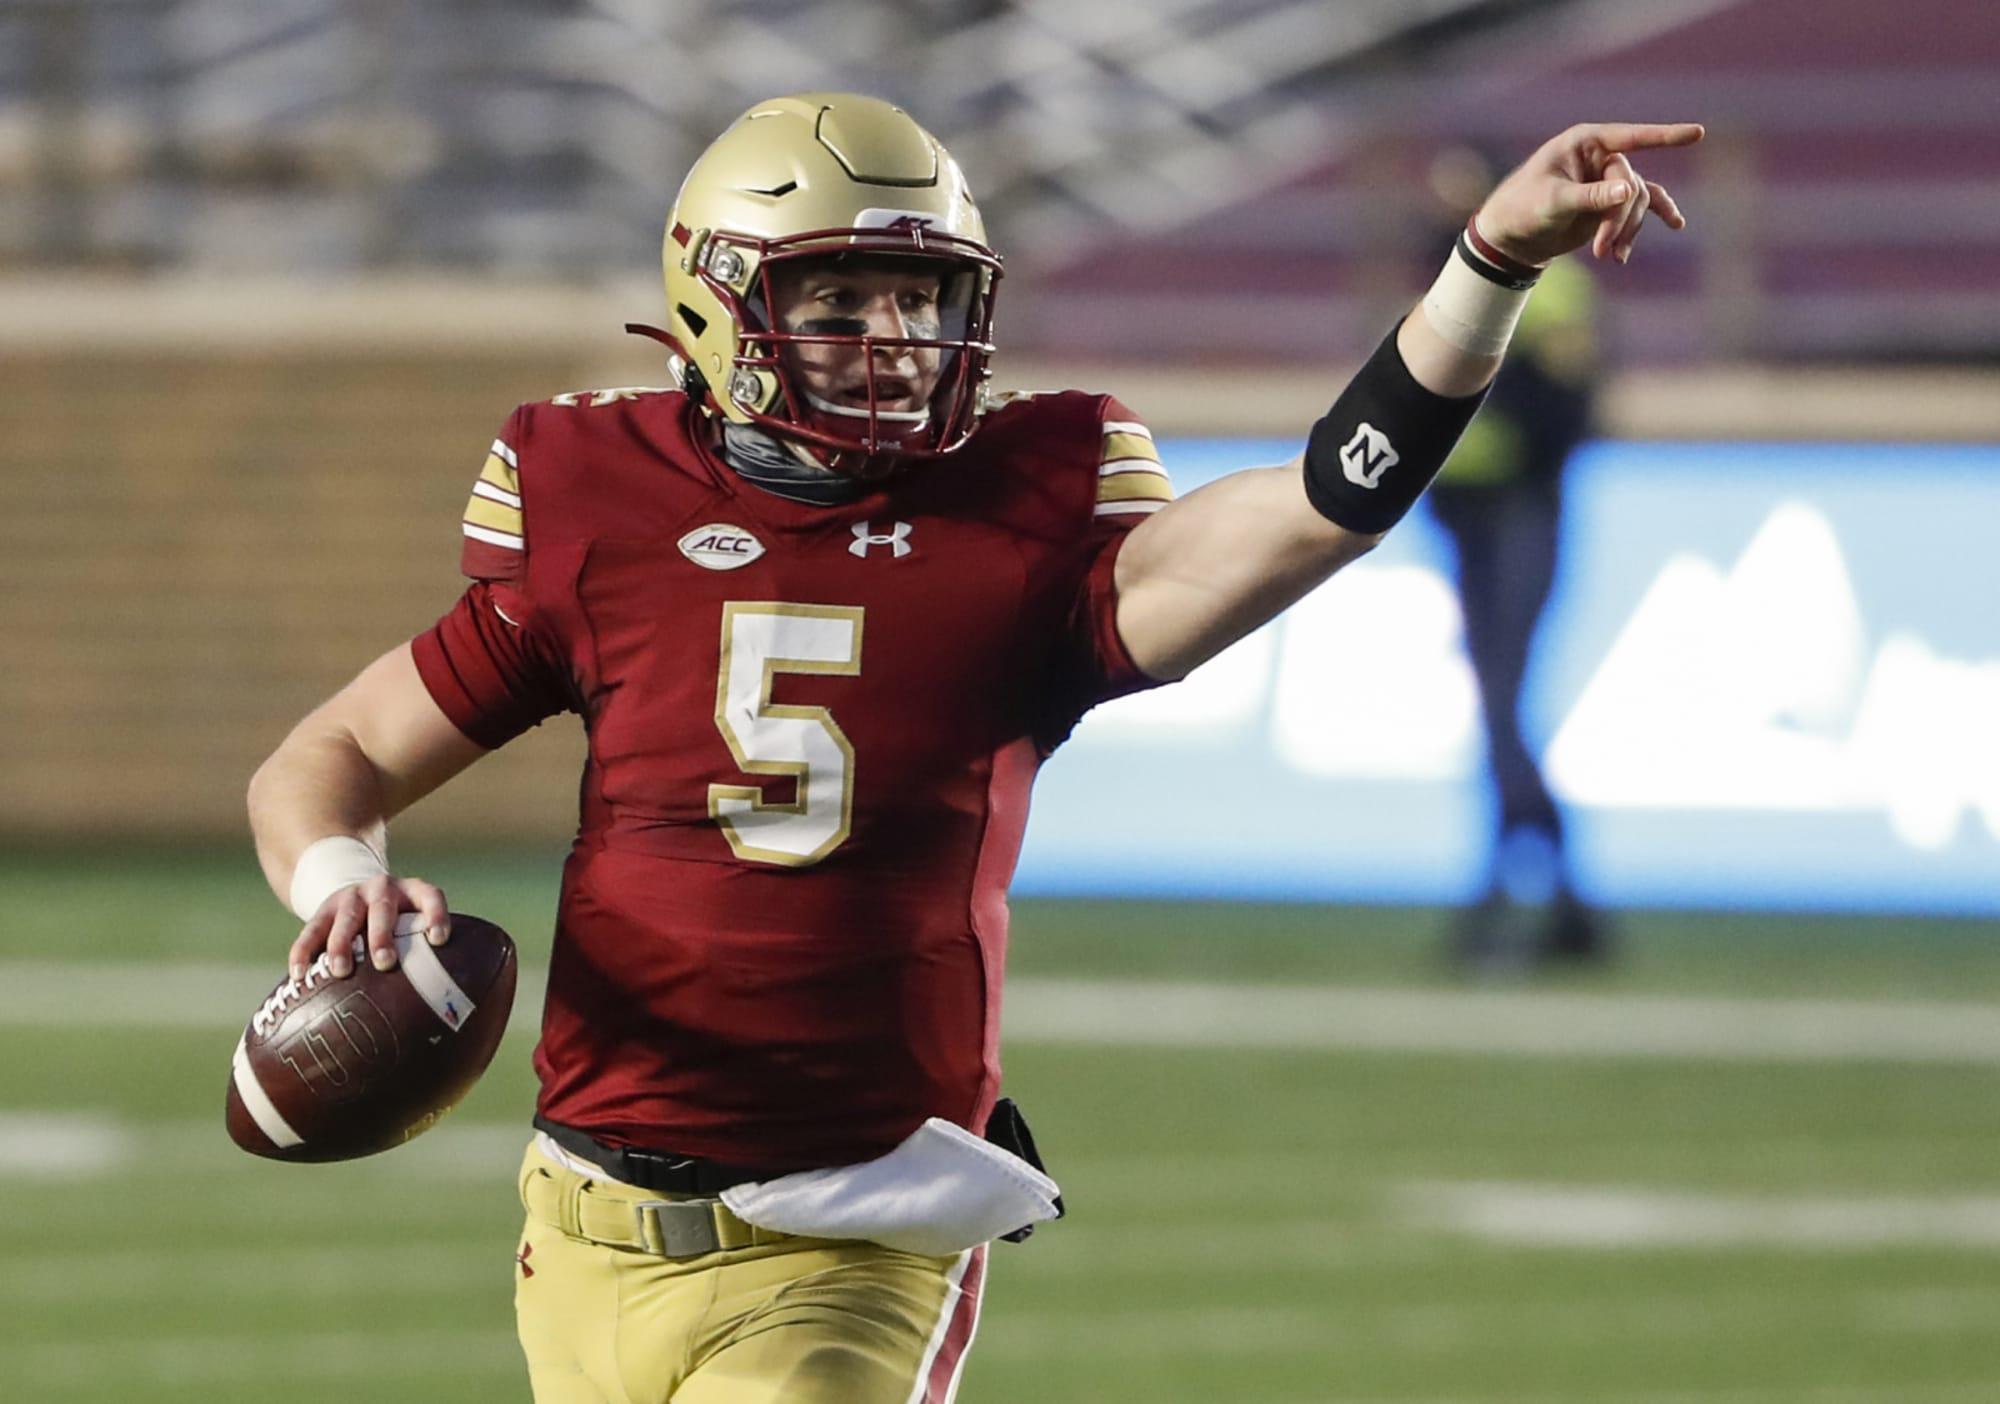 2022 NFL Draft: Don't sleep on Boston College QB Phil Jurkovec